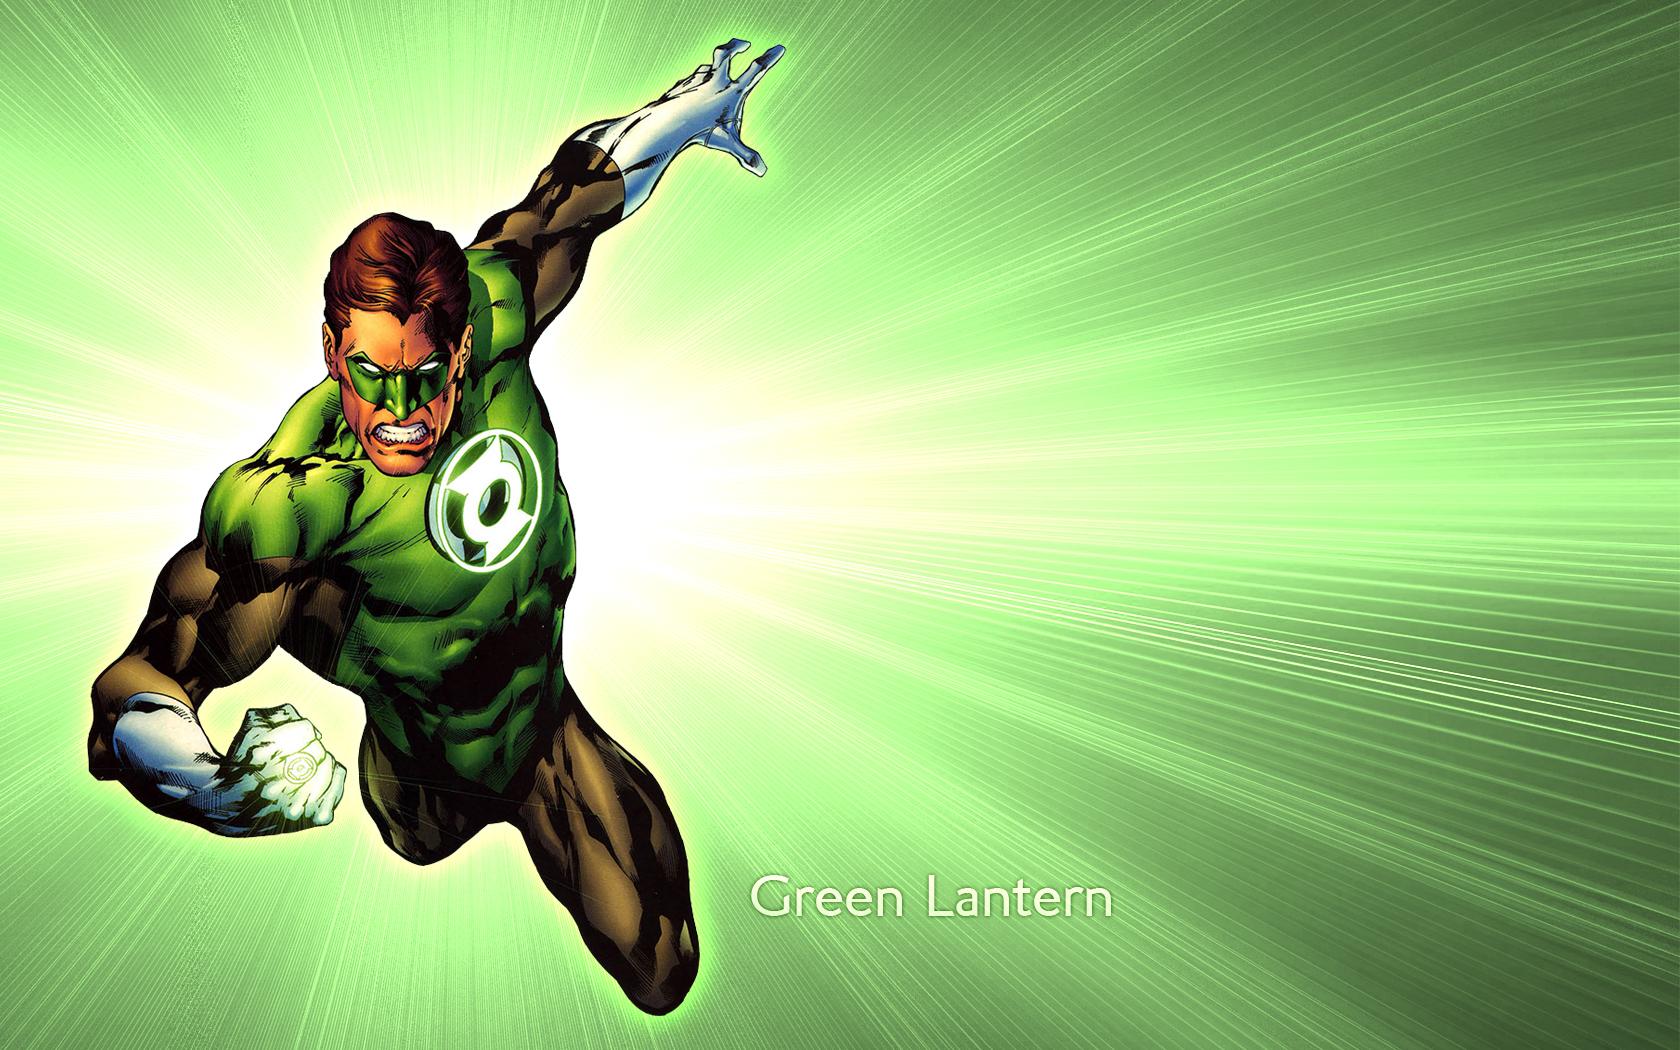 49] Green Lantern HD Wallpapers on WallpaperSafari 1680x1050